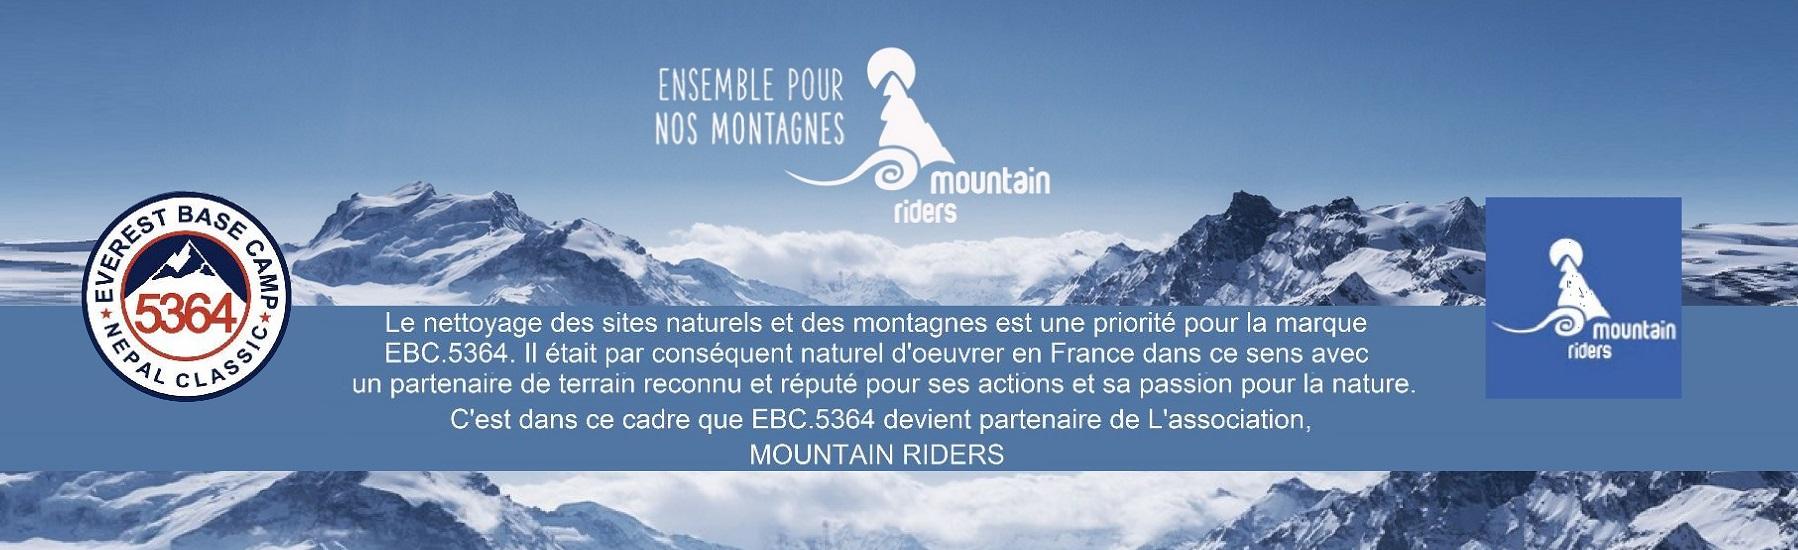 ebc 5364 mountain riders 2 - EBC 5364